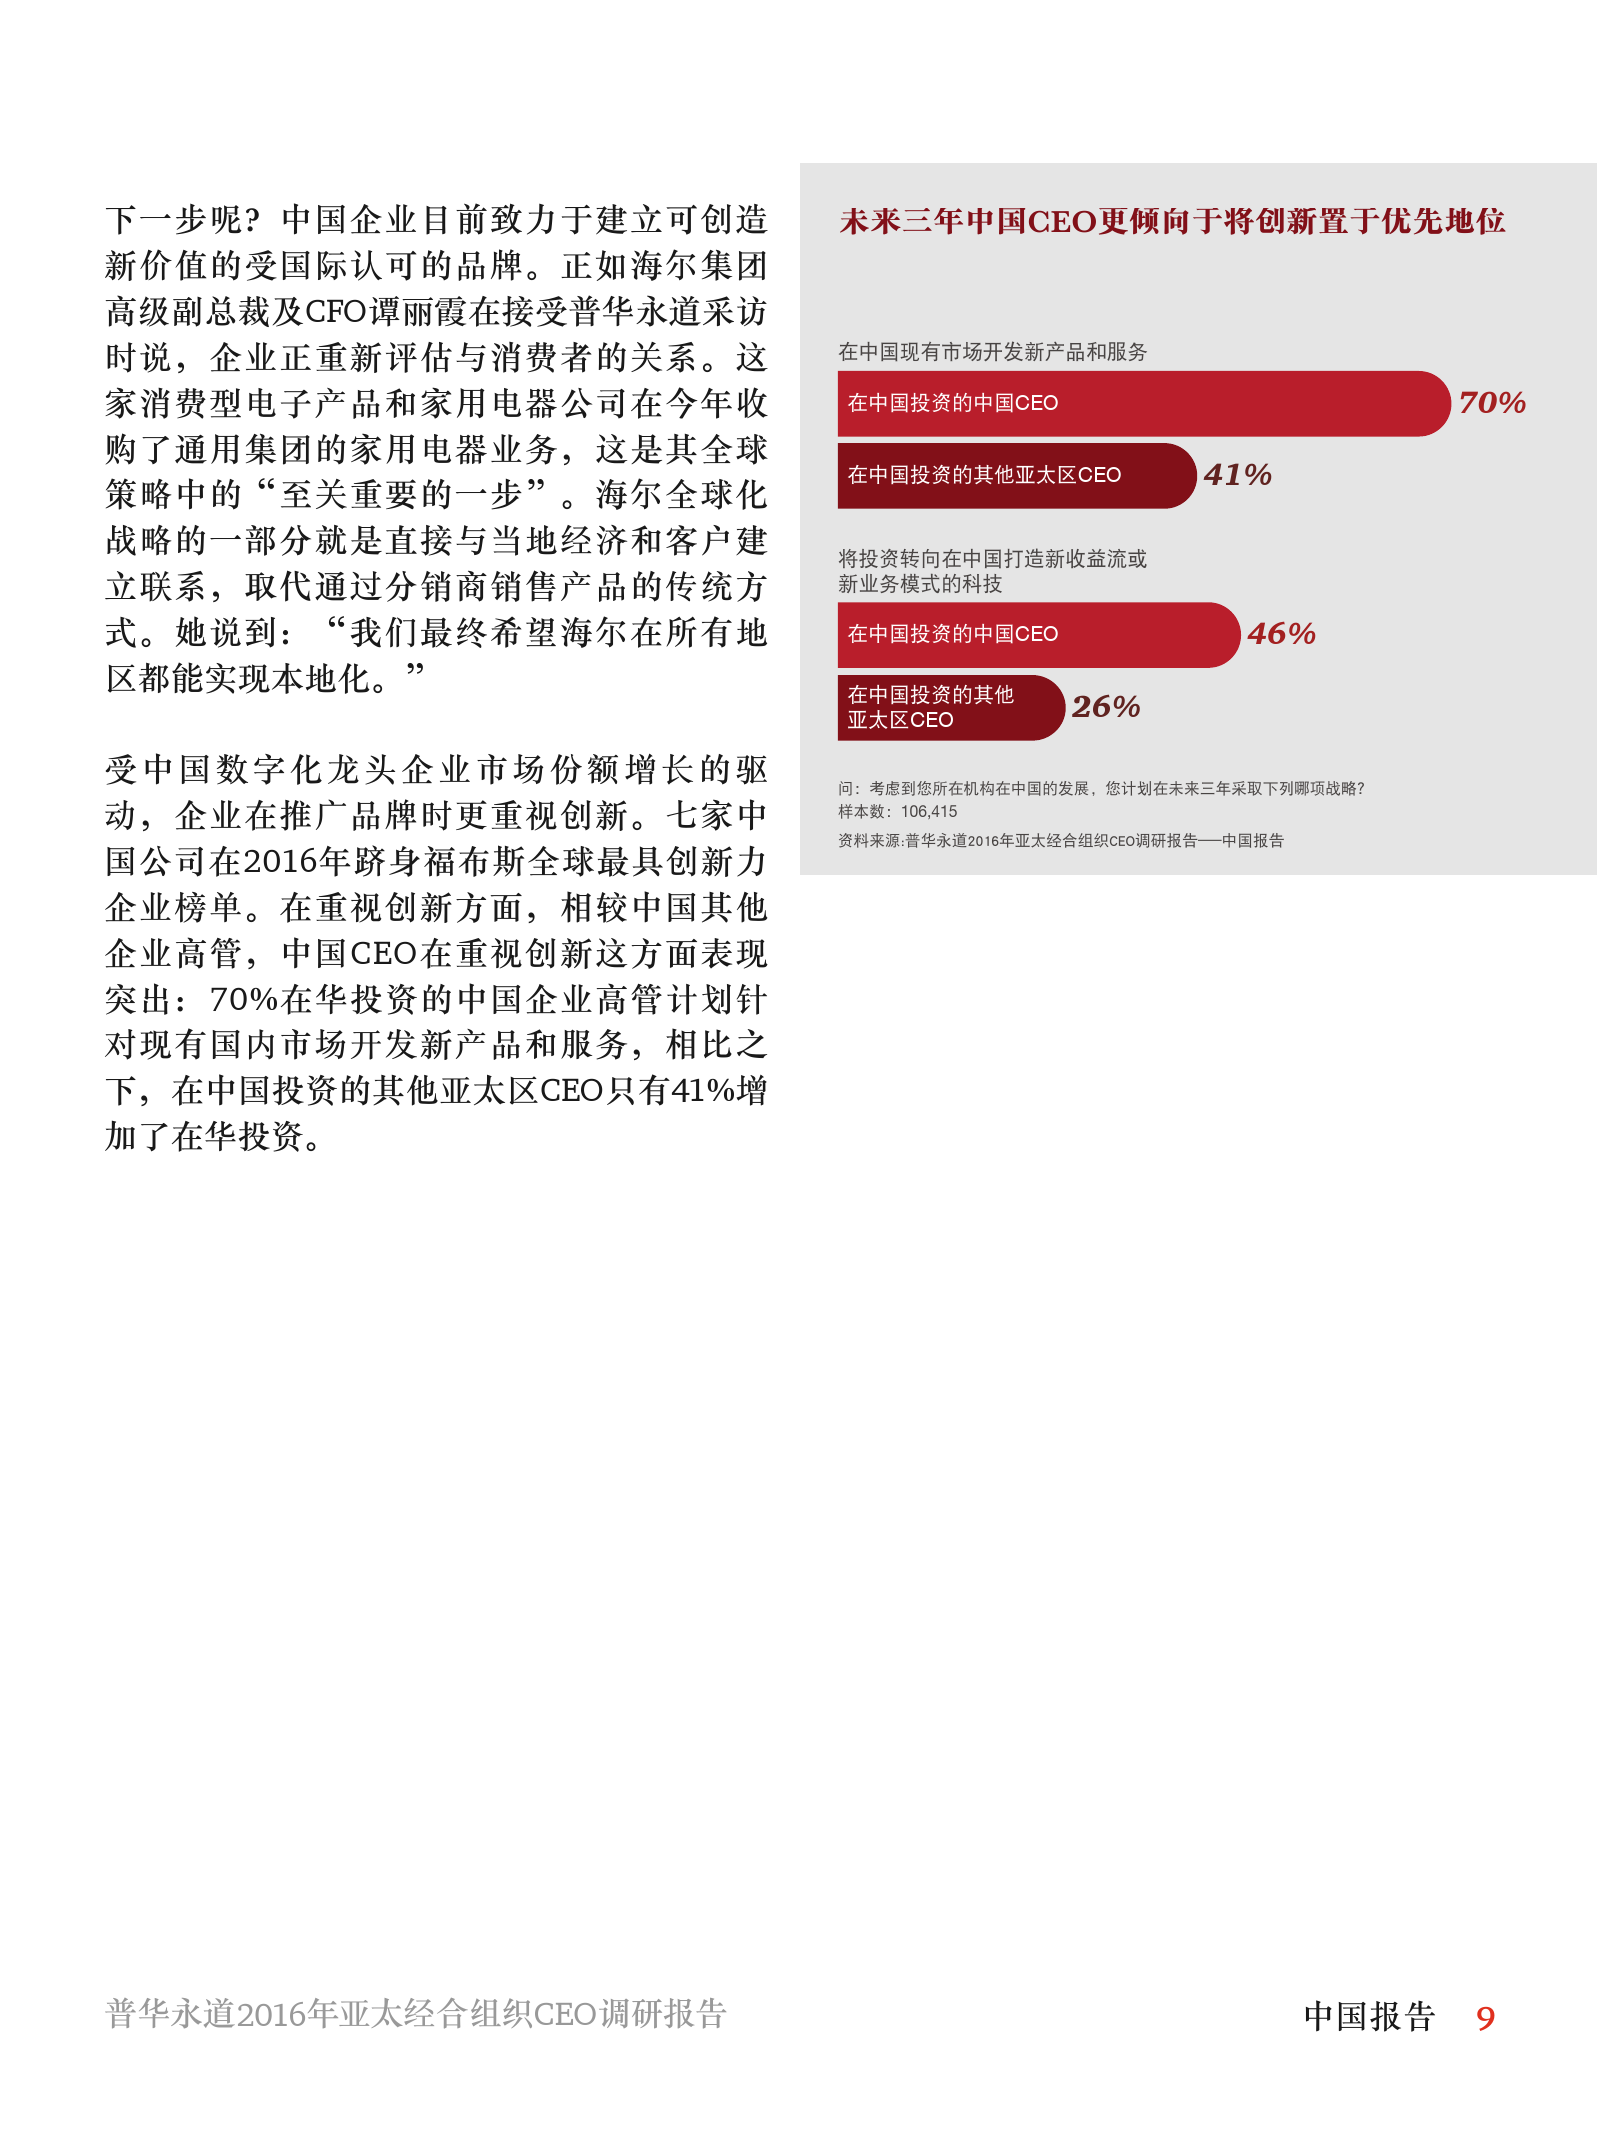 2016%e5%b9%b4%e4%ba%9a%e5%a4%aa%e7%bb%8f%e5%90%88%e7%bb%84%e7%bb%87ceo%e8%b0%83%e7%a0%94%e6%8a%a5%e5%91%8a_000011